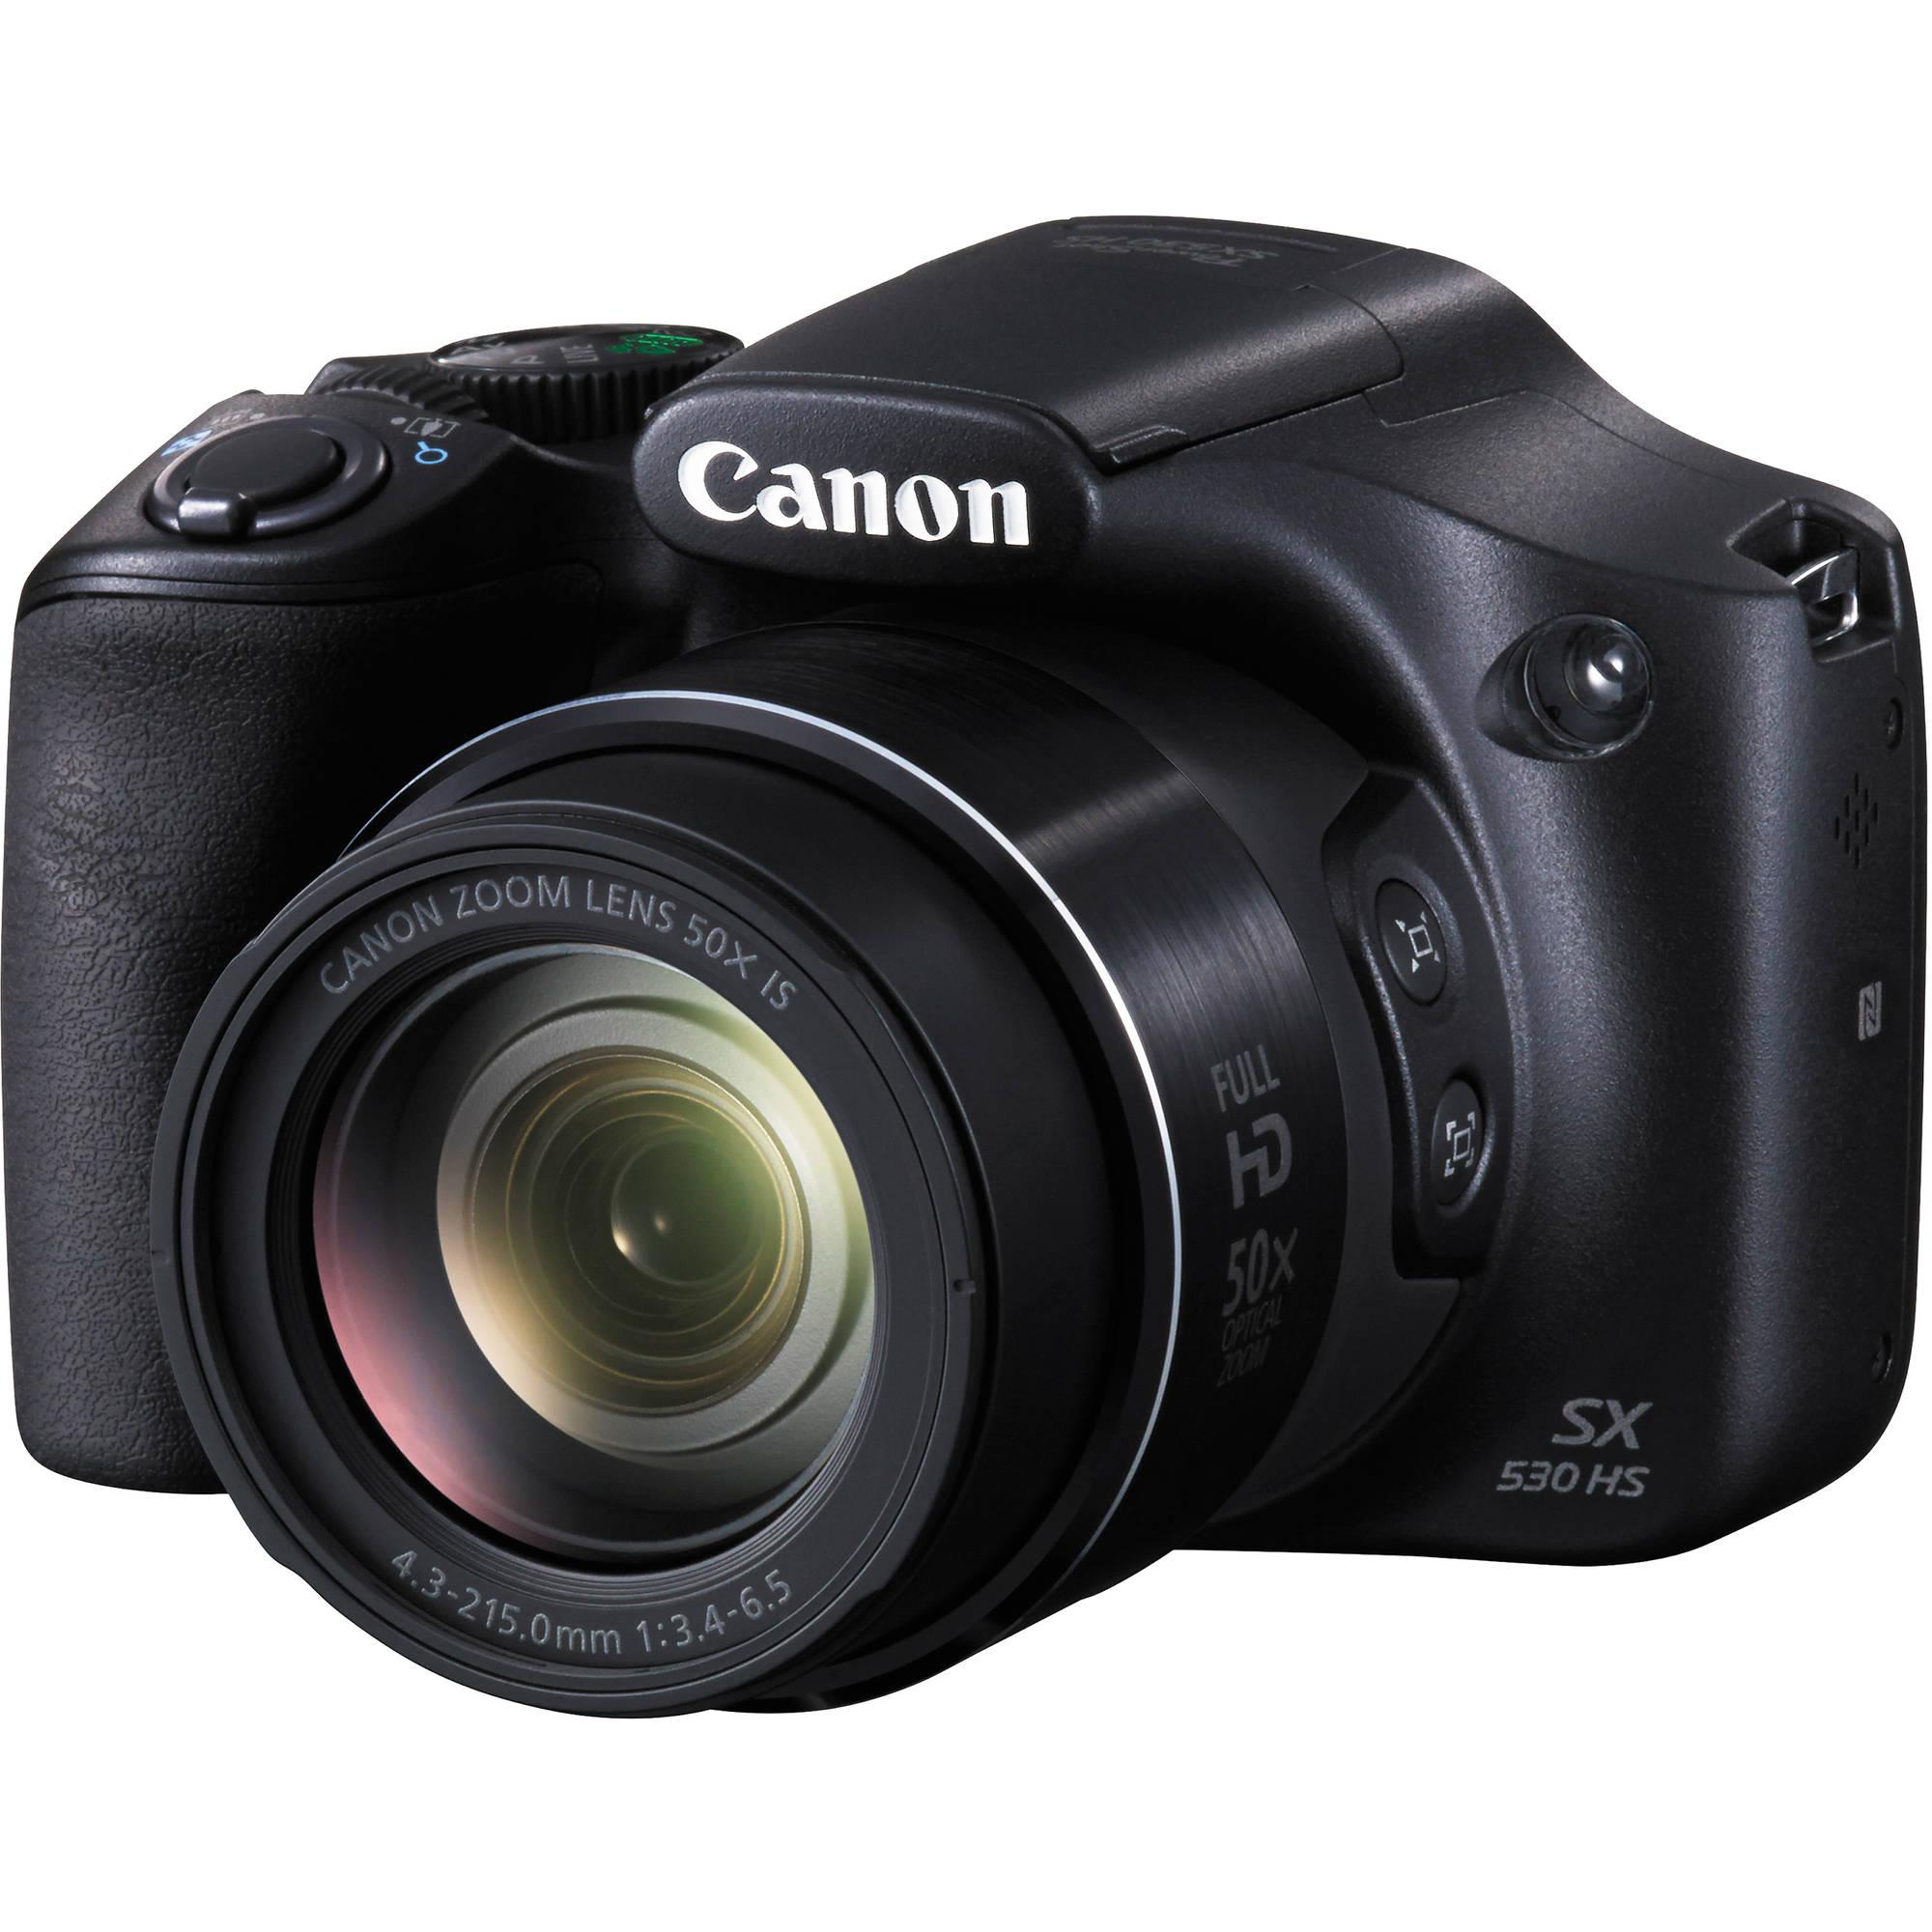 Smashing Canon Powershot Hs New Canon Powershot Cameras Announced At Ces 2015 Camera Rumors Canon Powershot Elph 160 Blurry S Canon Powershot Elph 160 Change Resolution dpreview Canon Powershot Elph 160